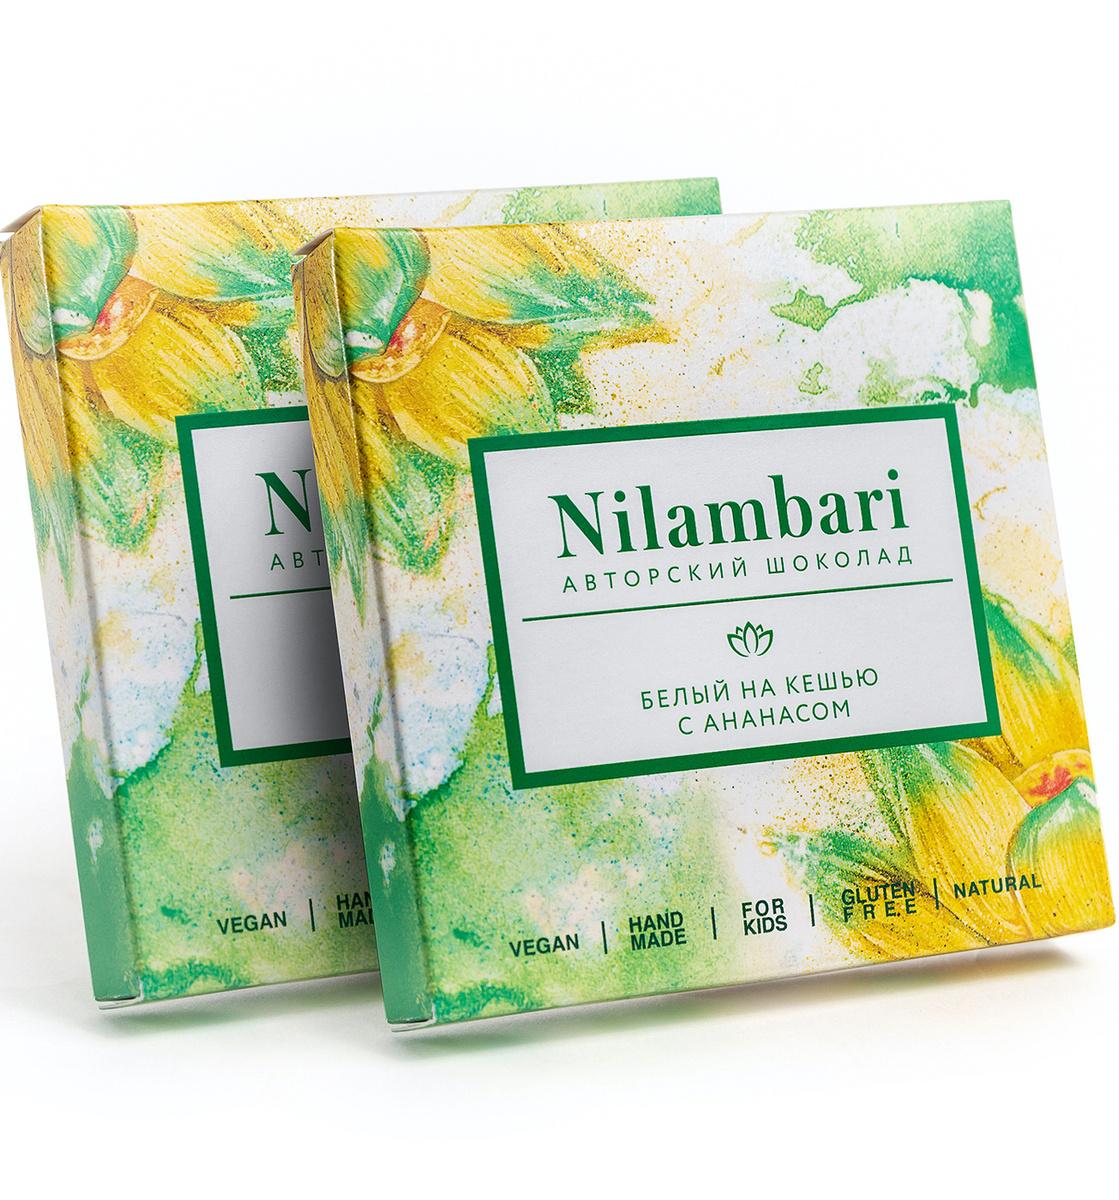 Шоколад Nilambari белый на кешью с ананасом Набор 2 шт. / GreenMania  #1